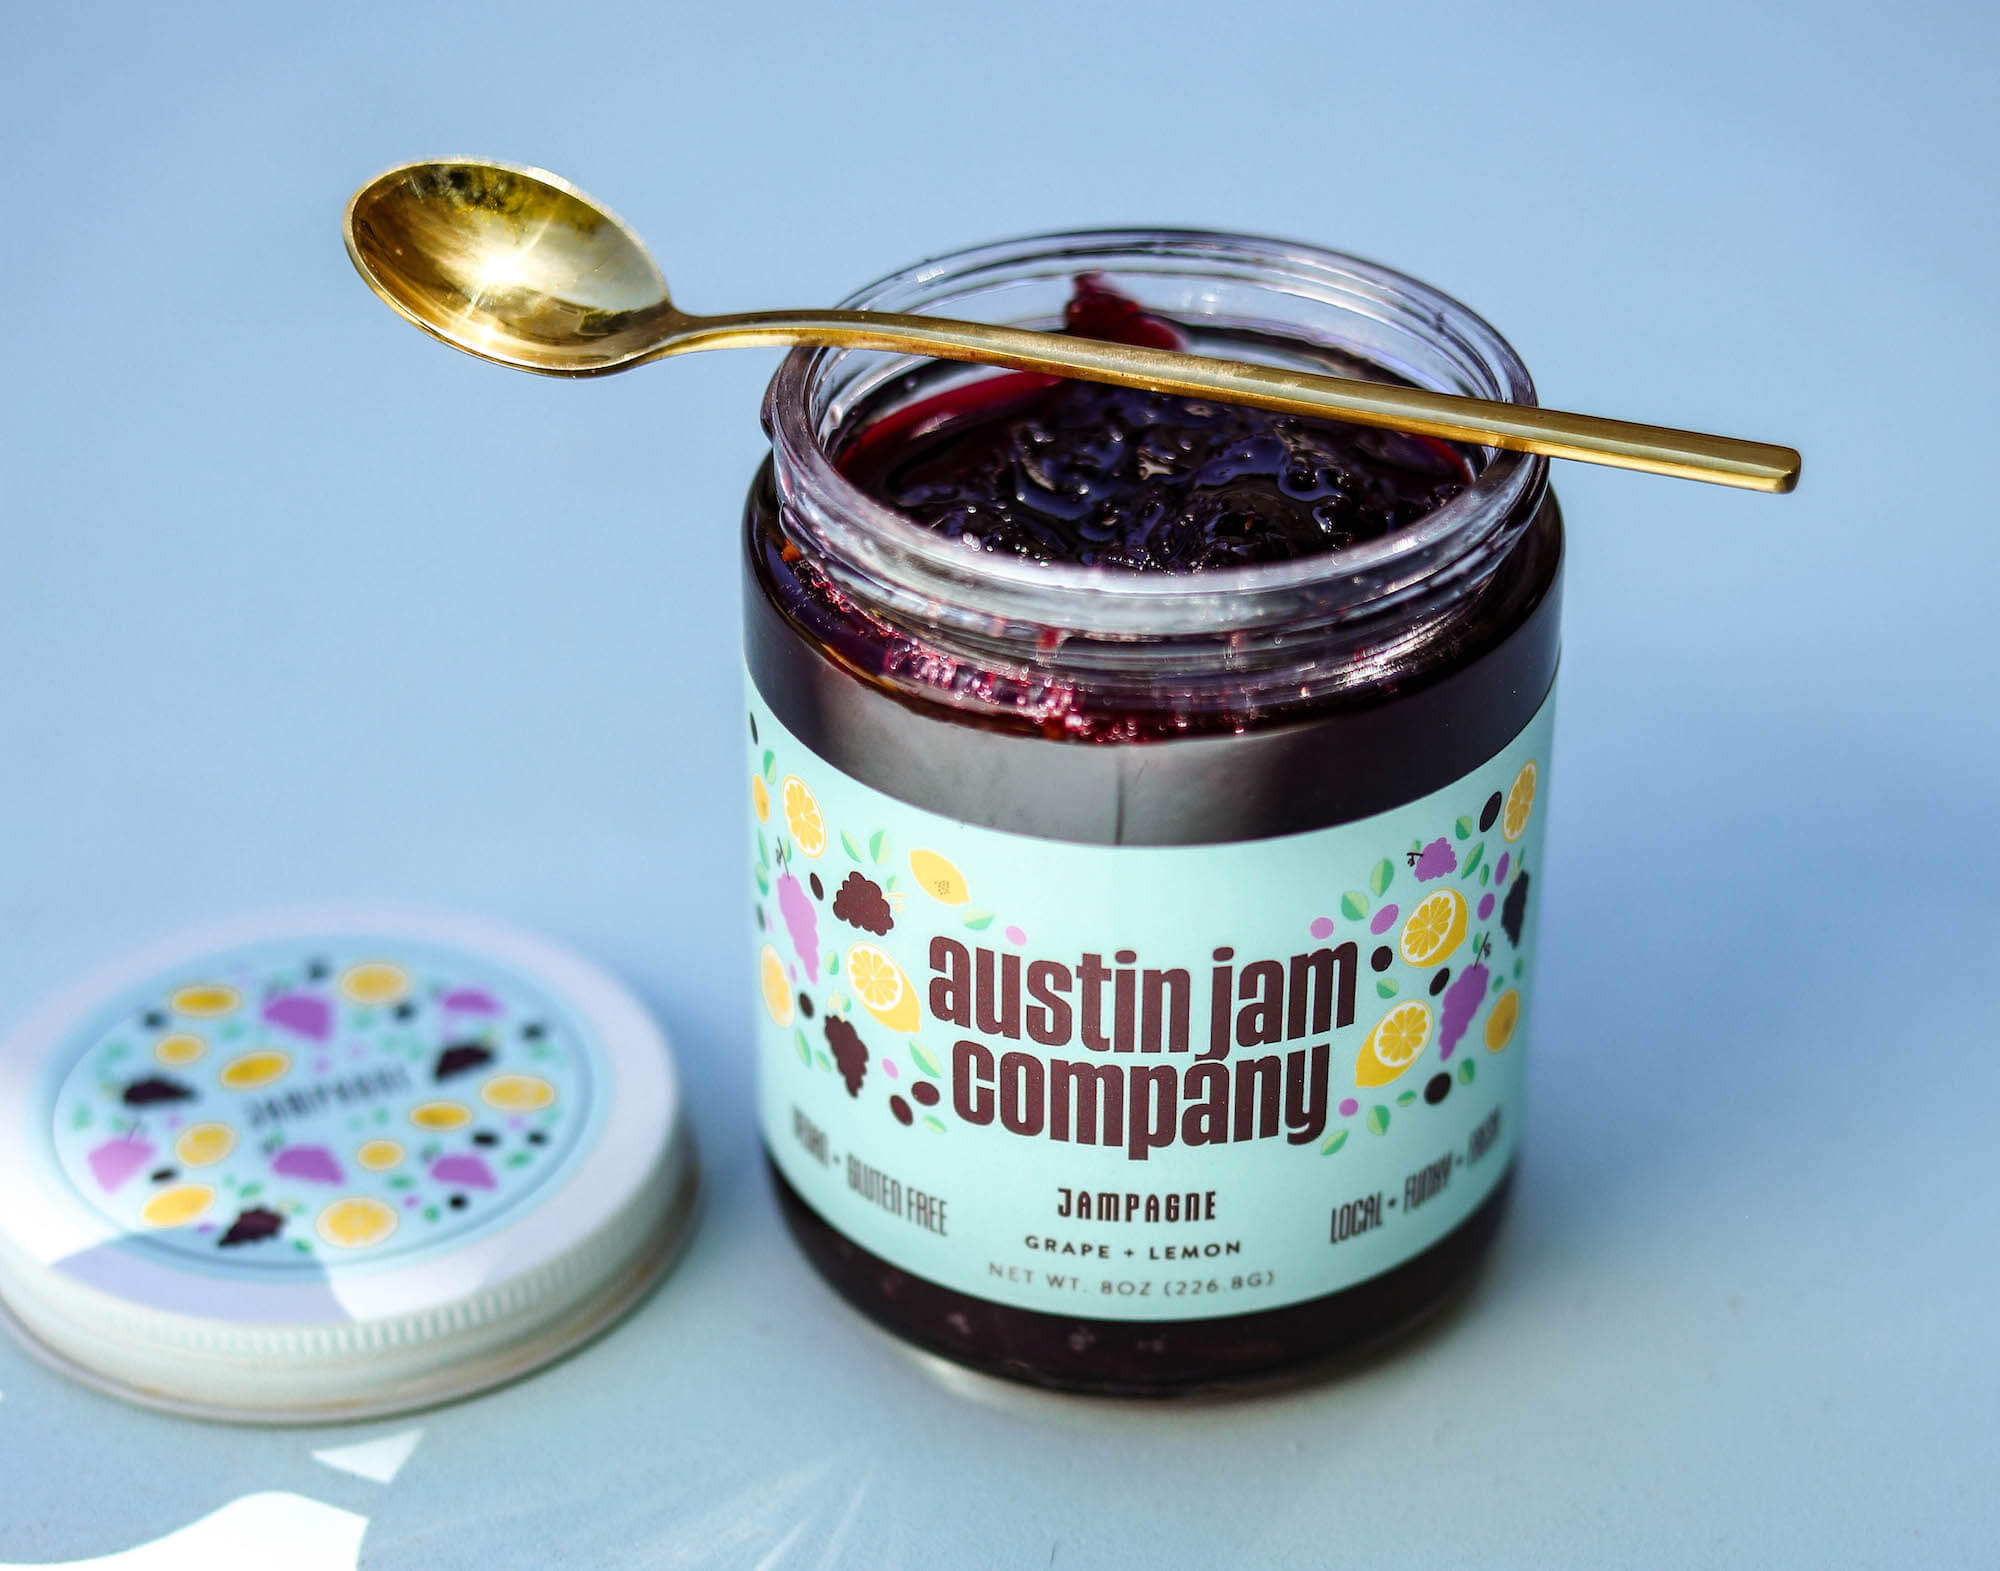 Austin Jam product